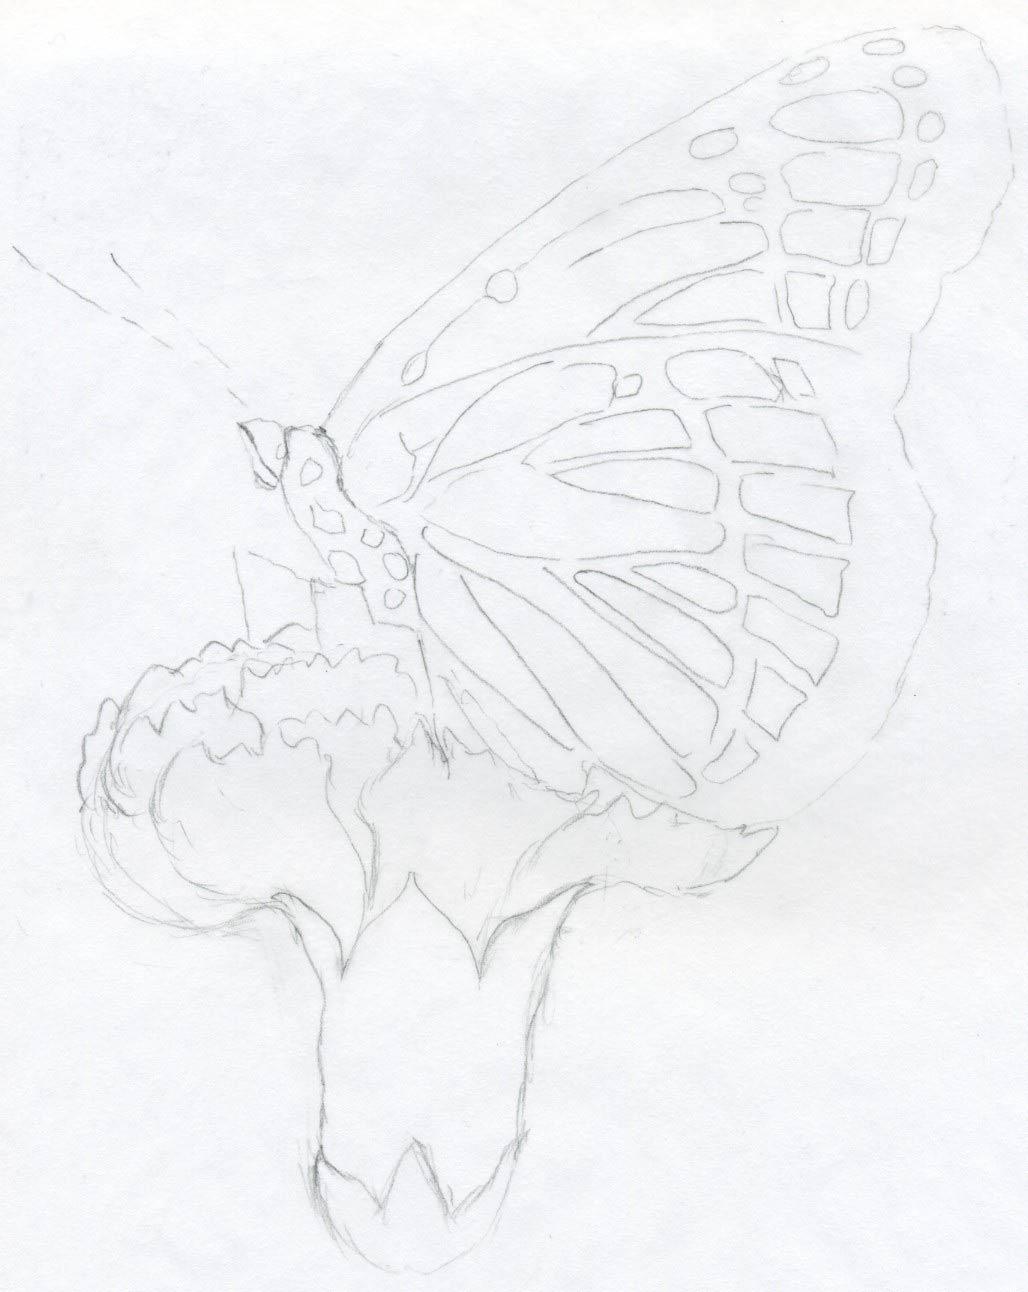 1028x1292 Pencil Sketch Girl Barbie Pori With Flower Barbie Image Pencil